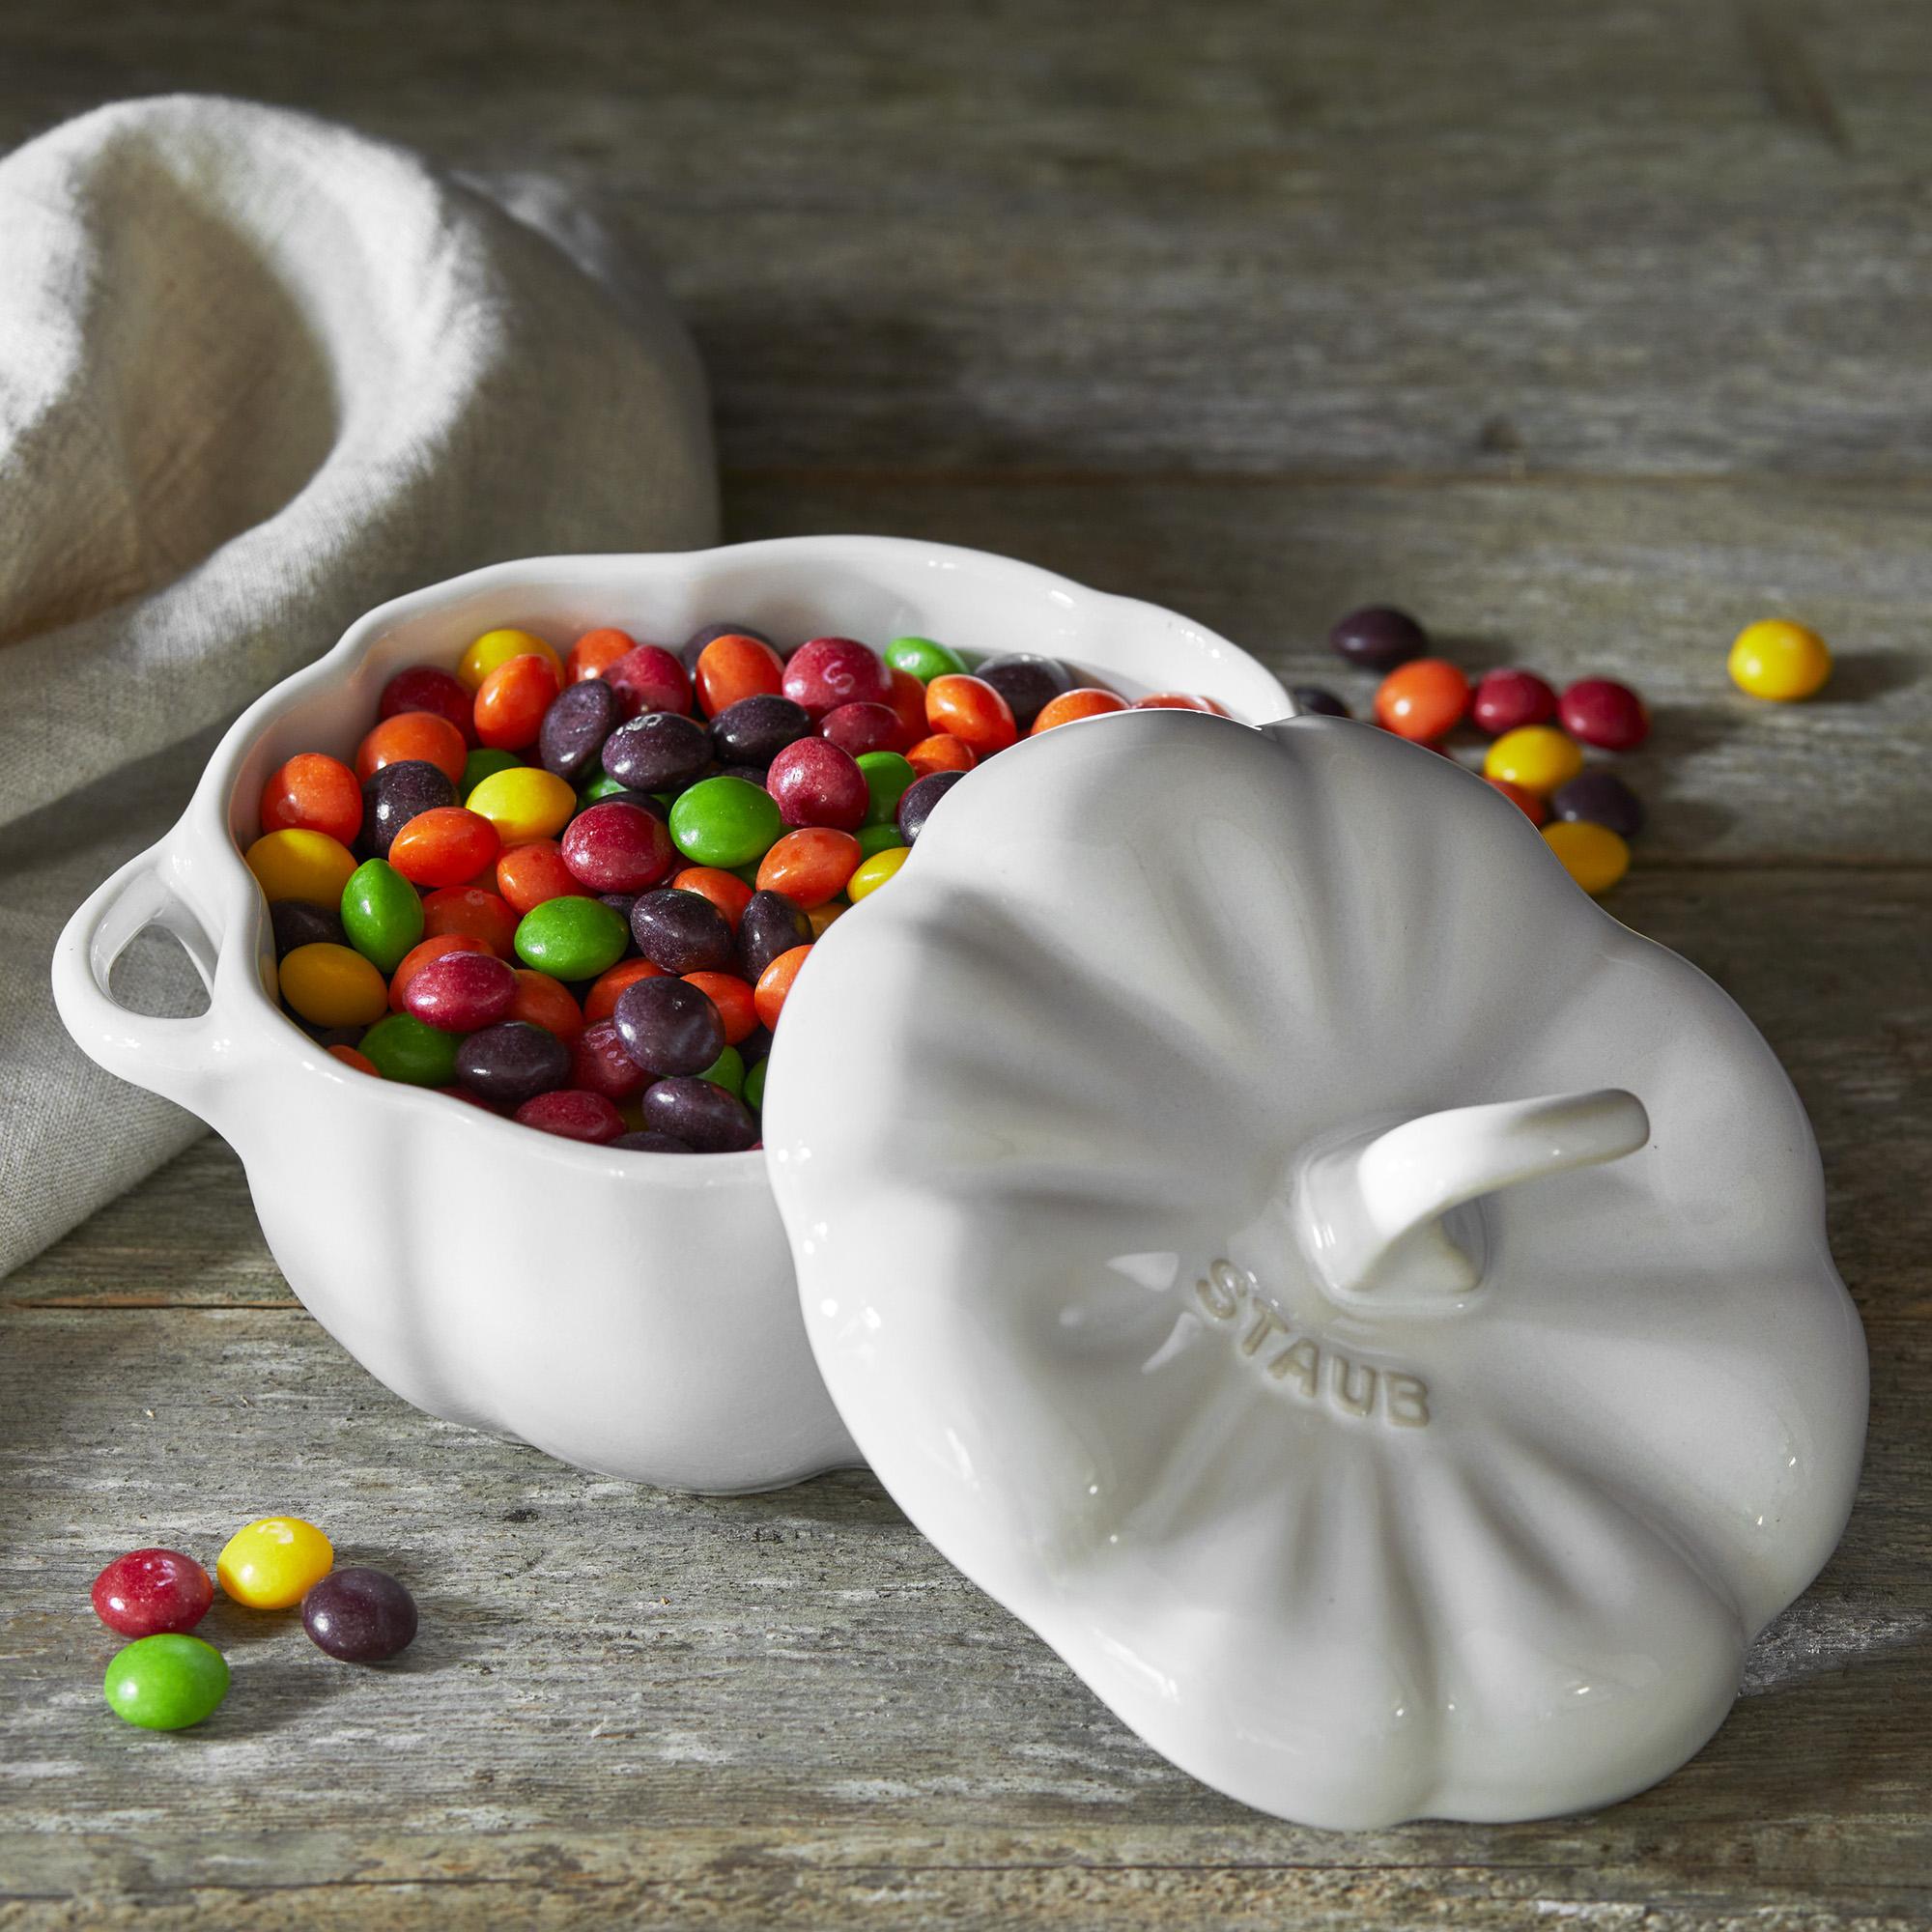 Staub-Ceramic-16-oz-Petite-Pumpkin-Cocotte thumbnail 24